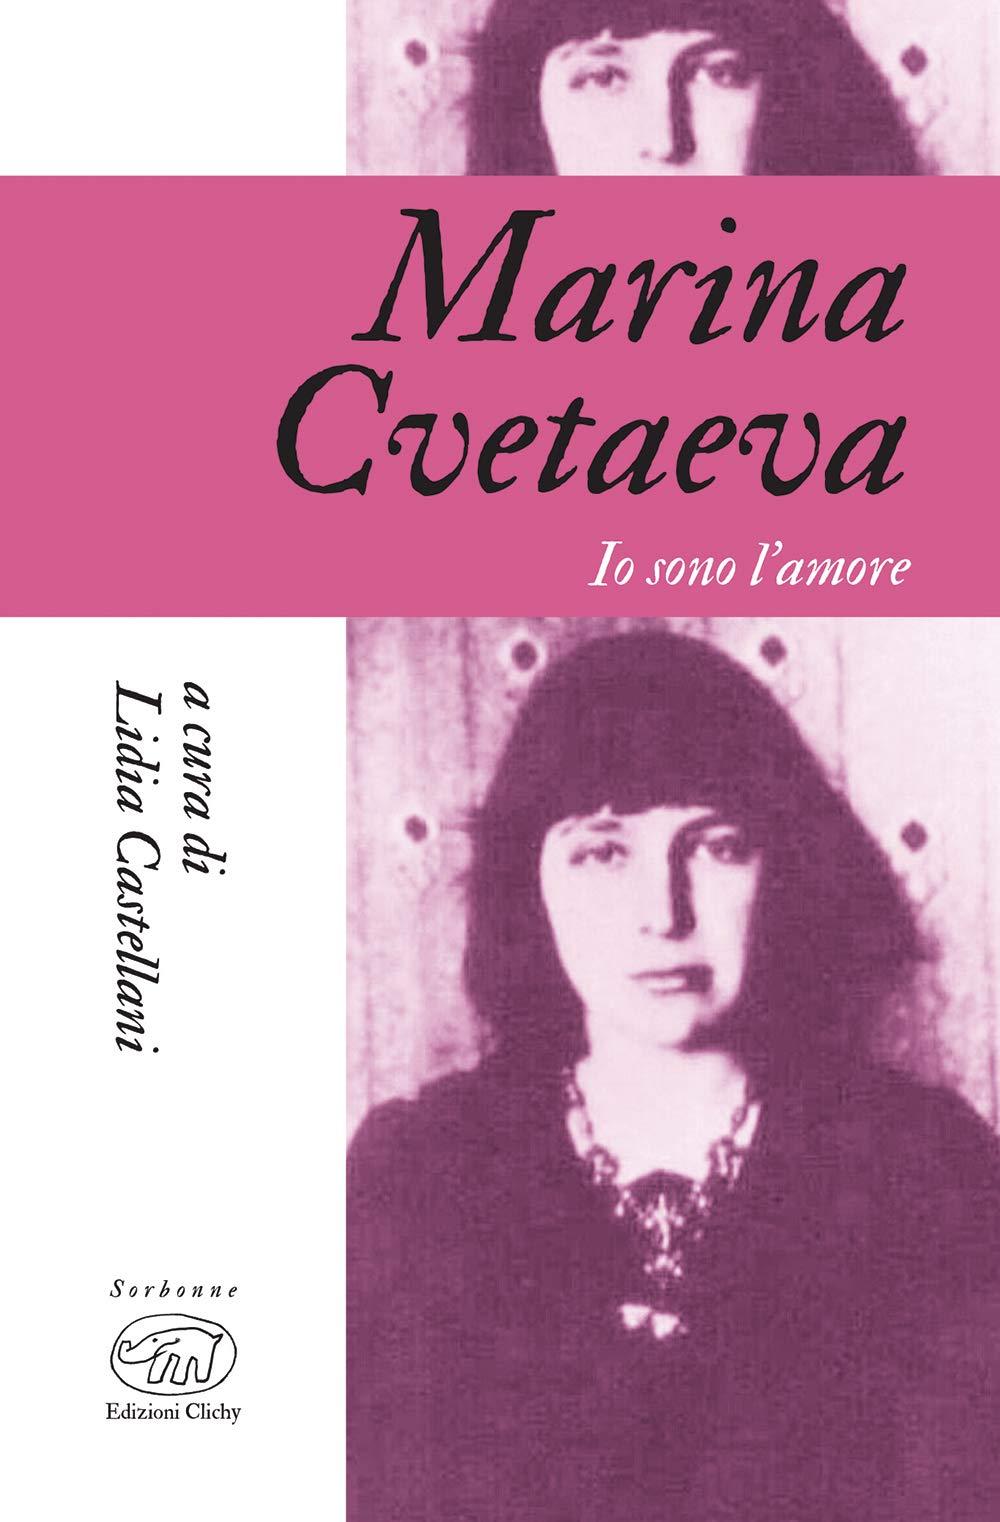 EVENTO SOSPESO. Sabato 21 Marzo, ore 17:30 LIDIA CASTELLANI presenta ' Marina Cvetaeva'